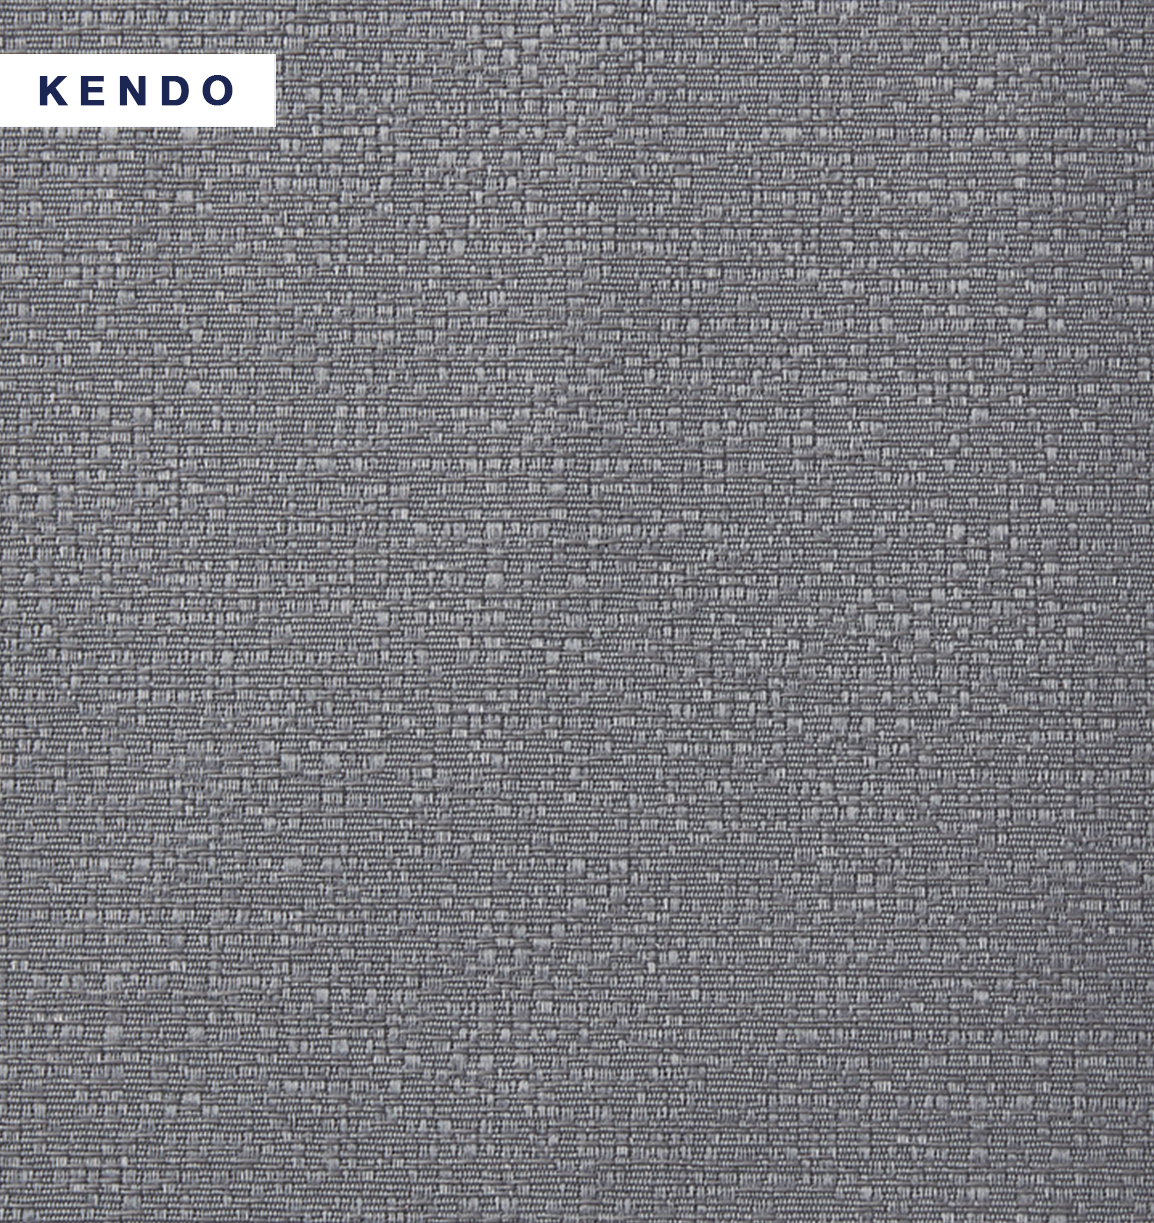 Linna - Kendo.jpg